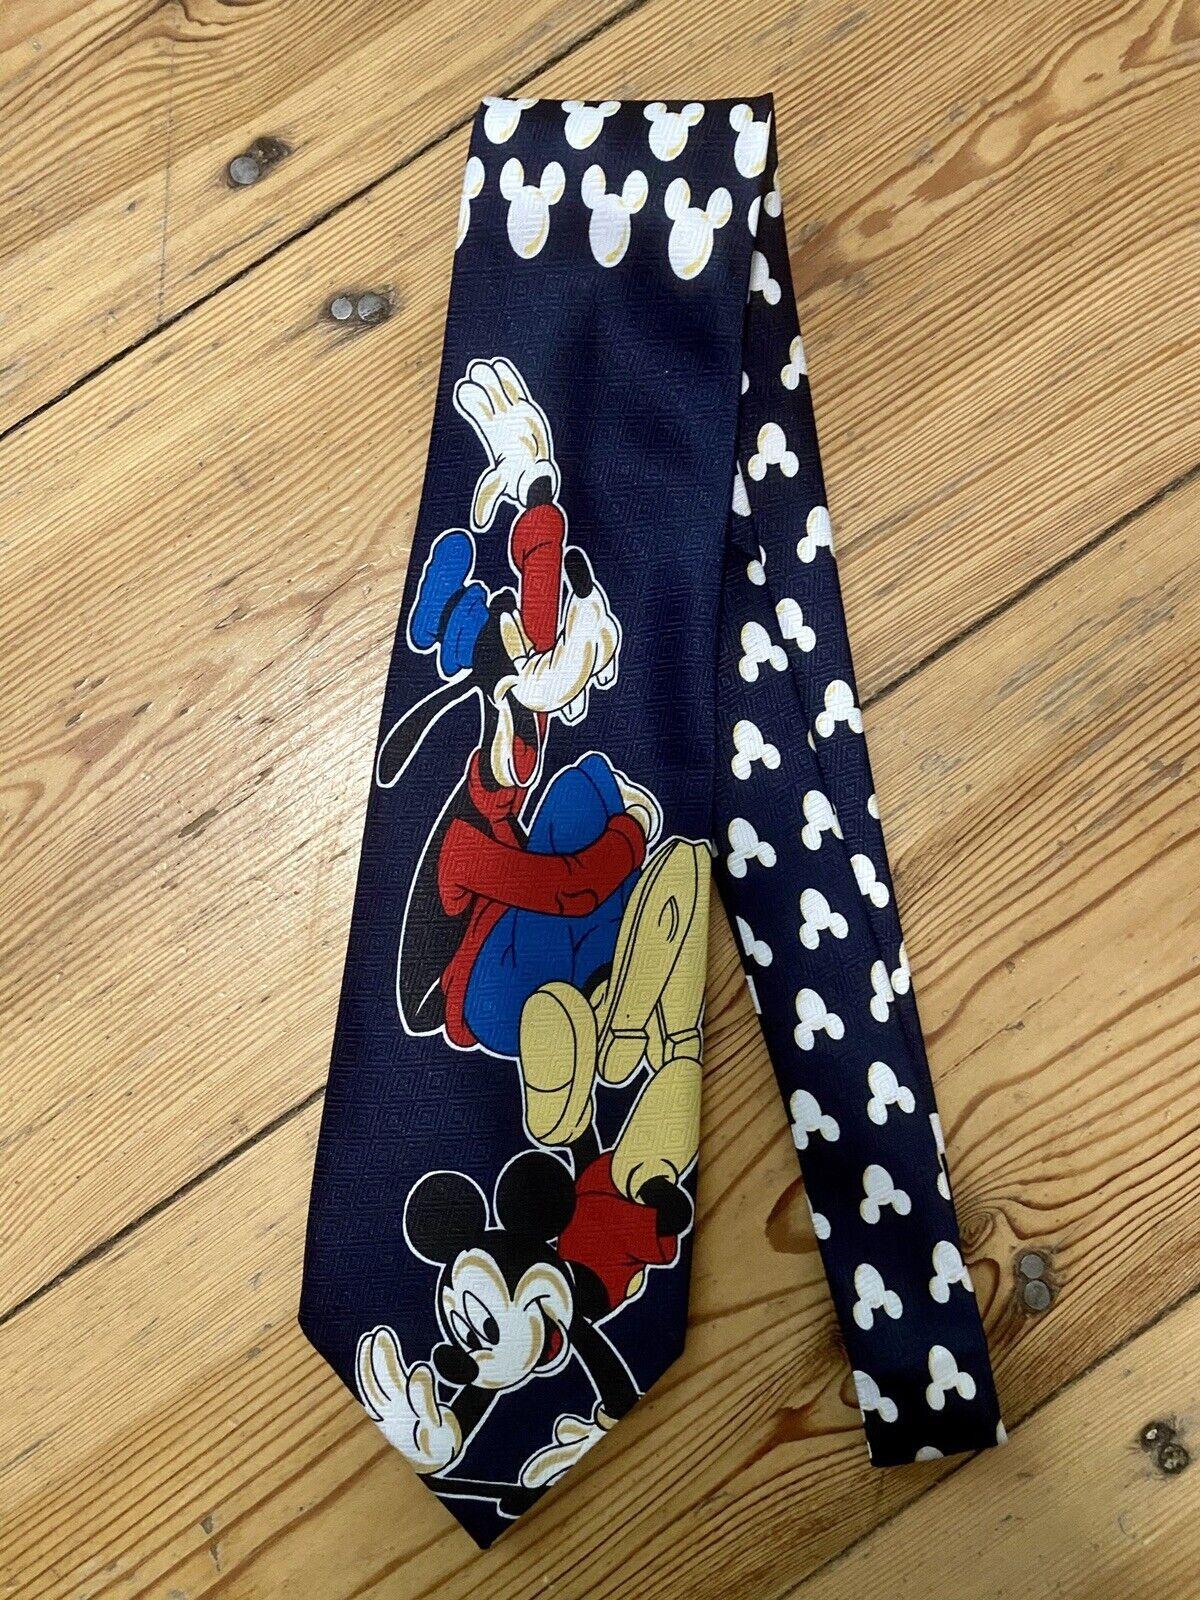 Disney Mickey Goofy Micky Maus Seidenkrawatte Krawatte Schlips Seide BLITZVERSND